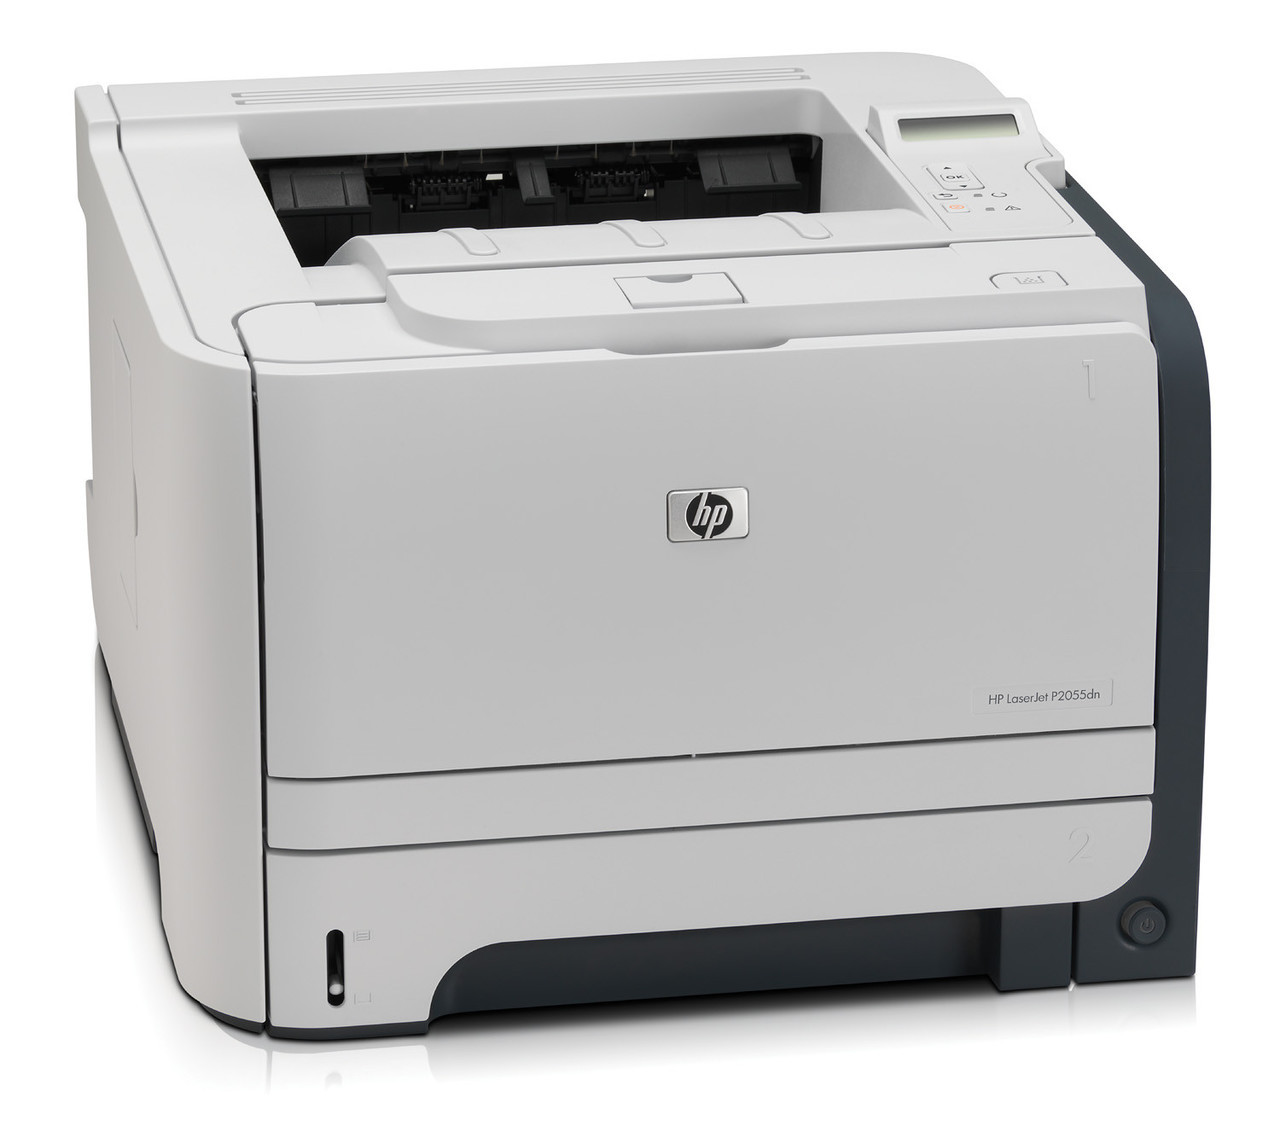 HP Laserjet P2055dn - CE459A - HP Laser Printer for sale